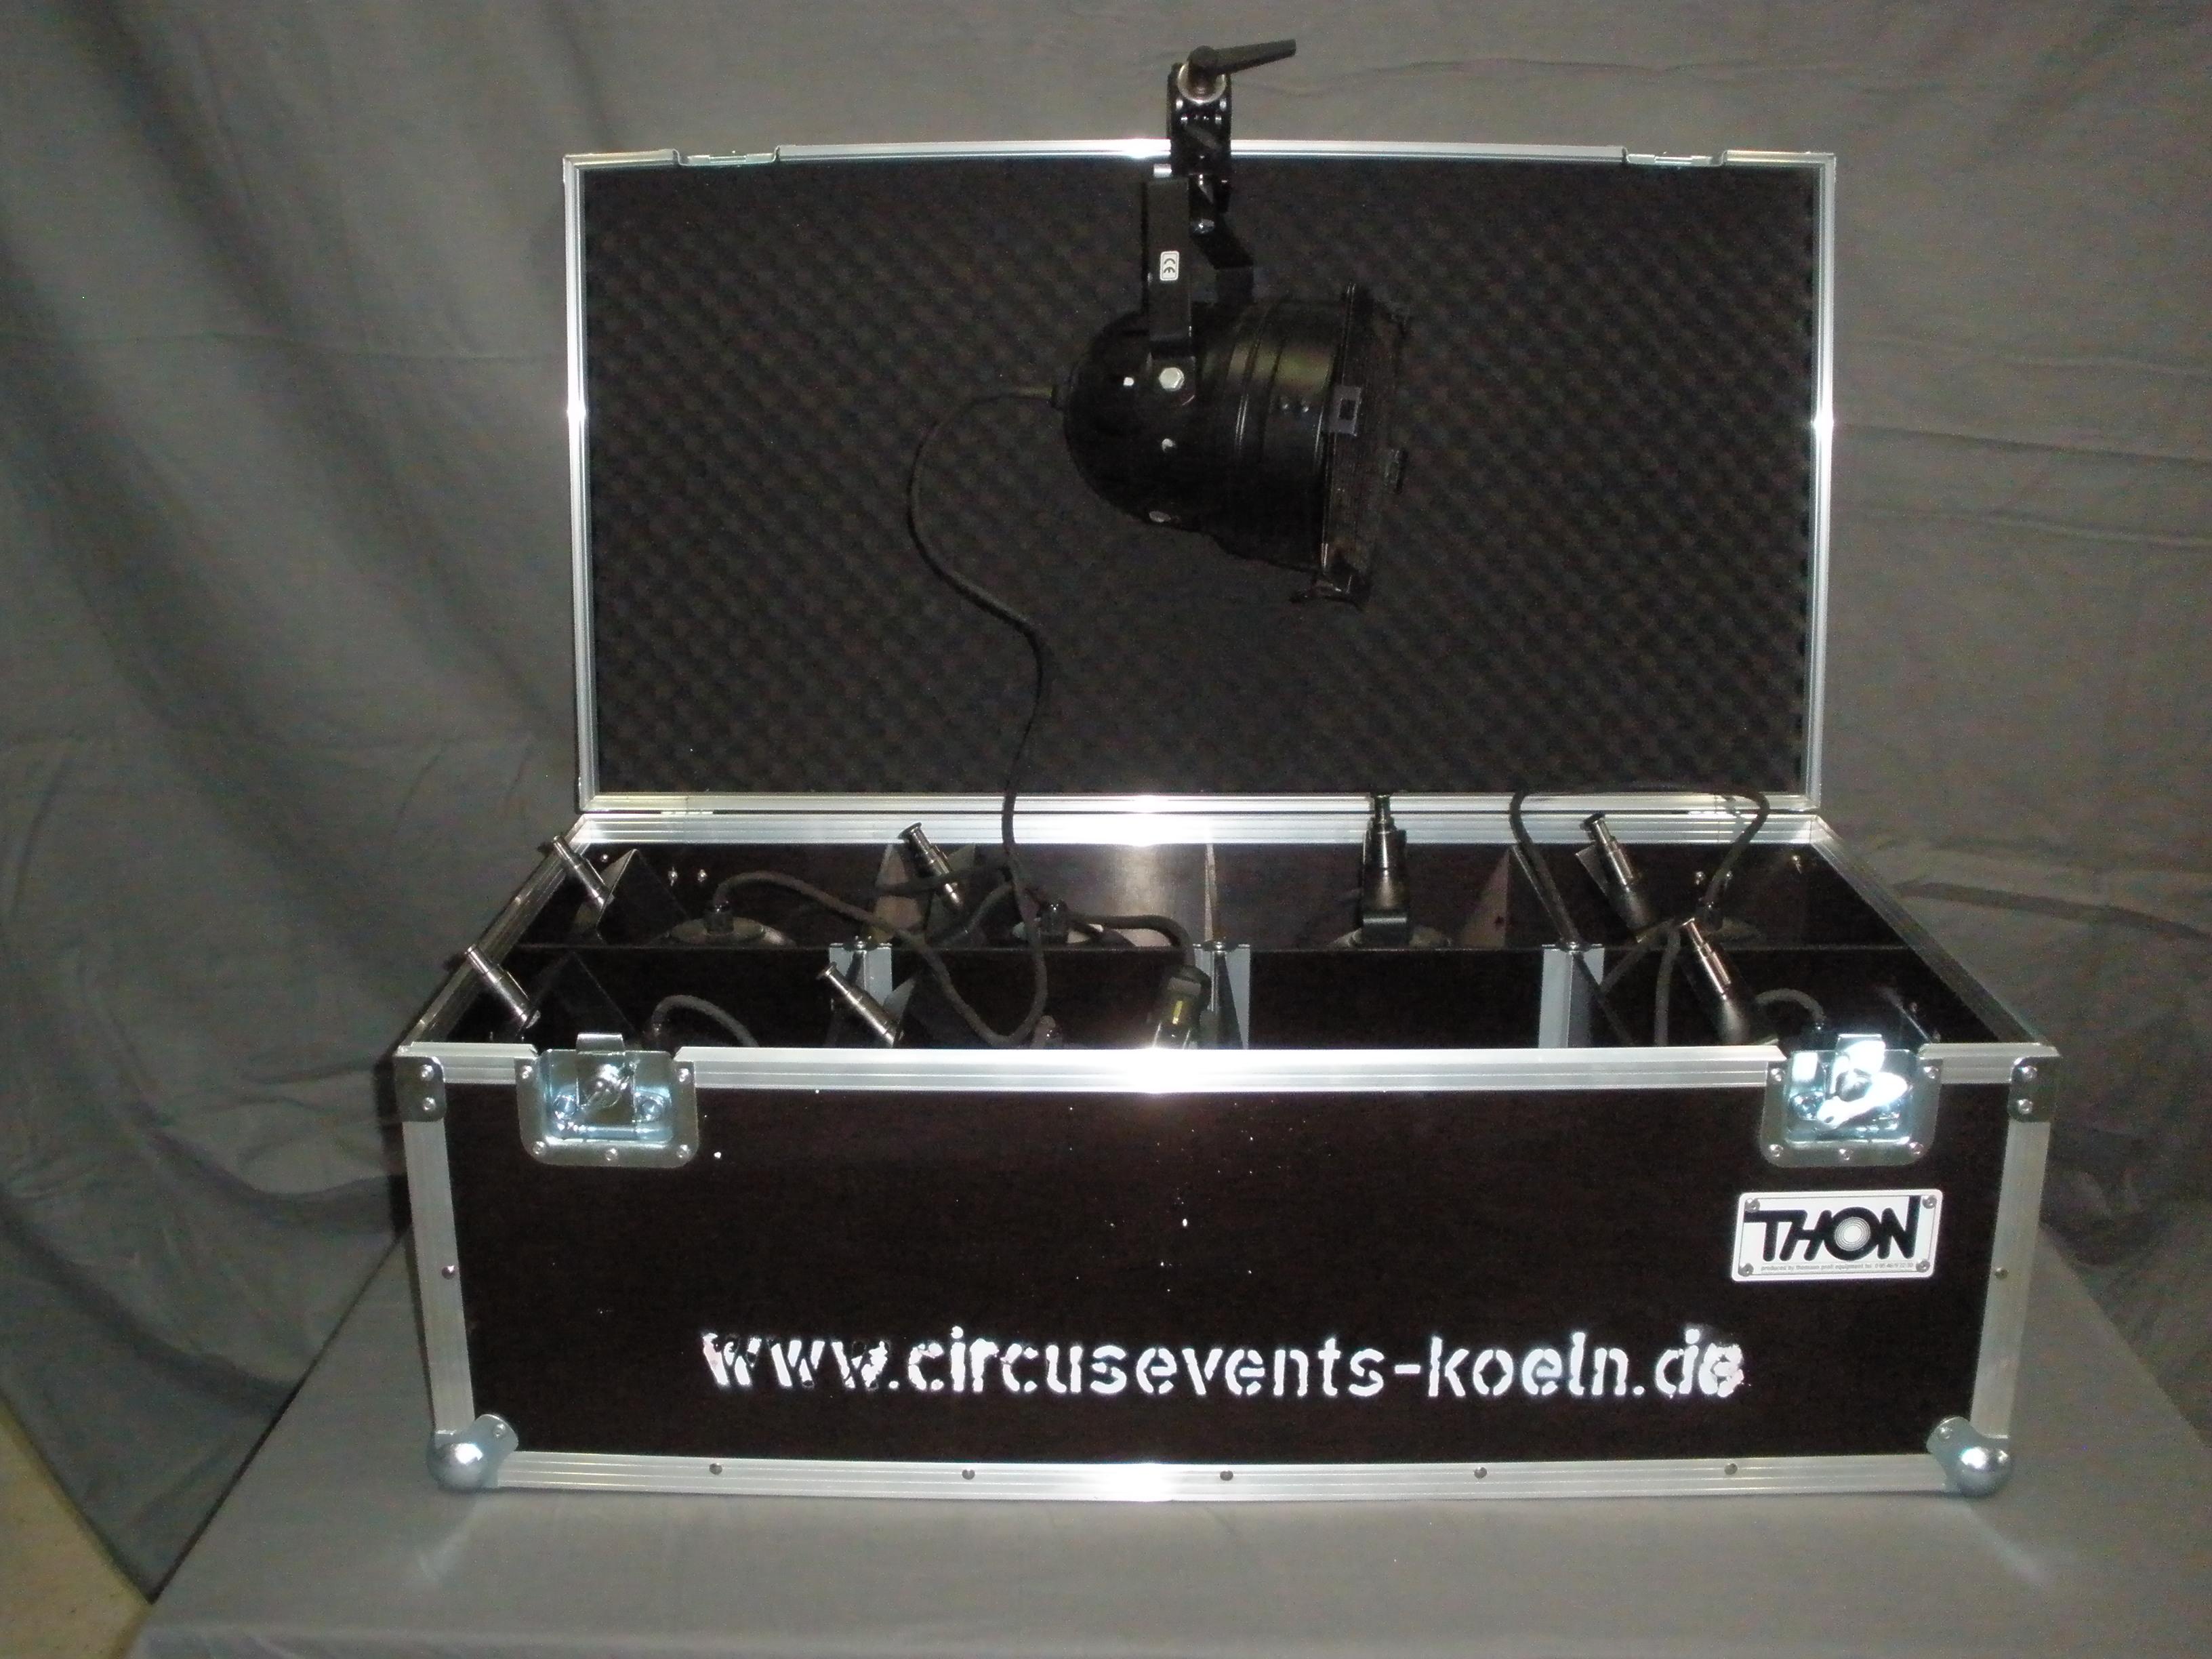 PAR 56 Spots Short/ Black Professioneller PAR 56 Spot, mit Floorstand bzw. Manfrotto Clamp Stromanschluss 230 V. 300W